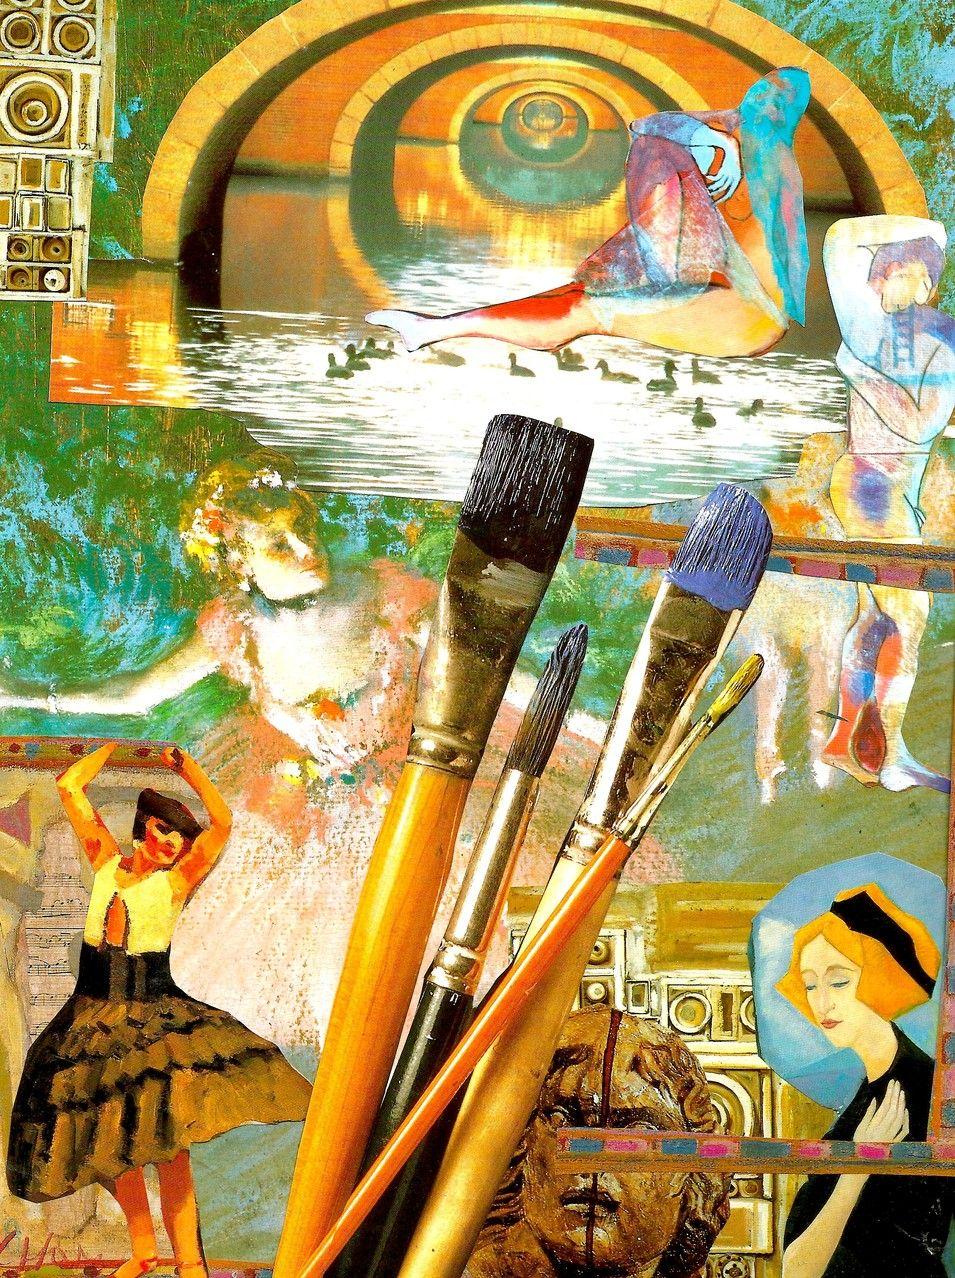 Expressive art online the art of emotional